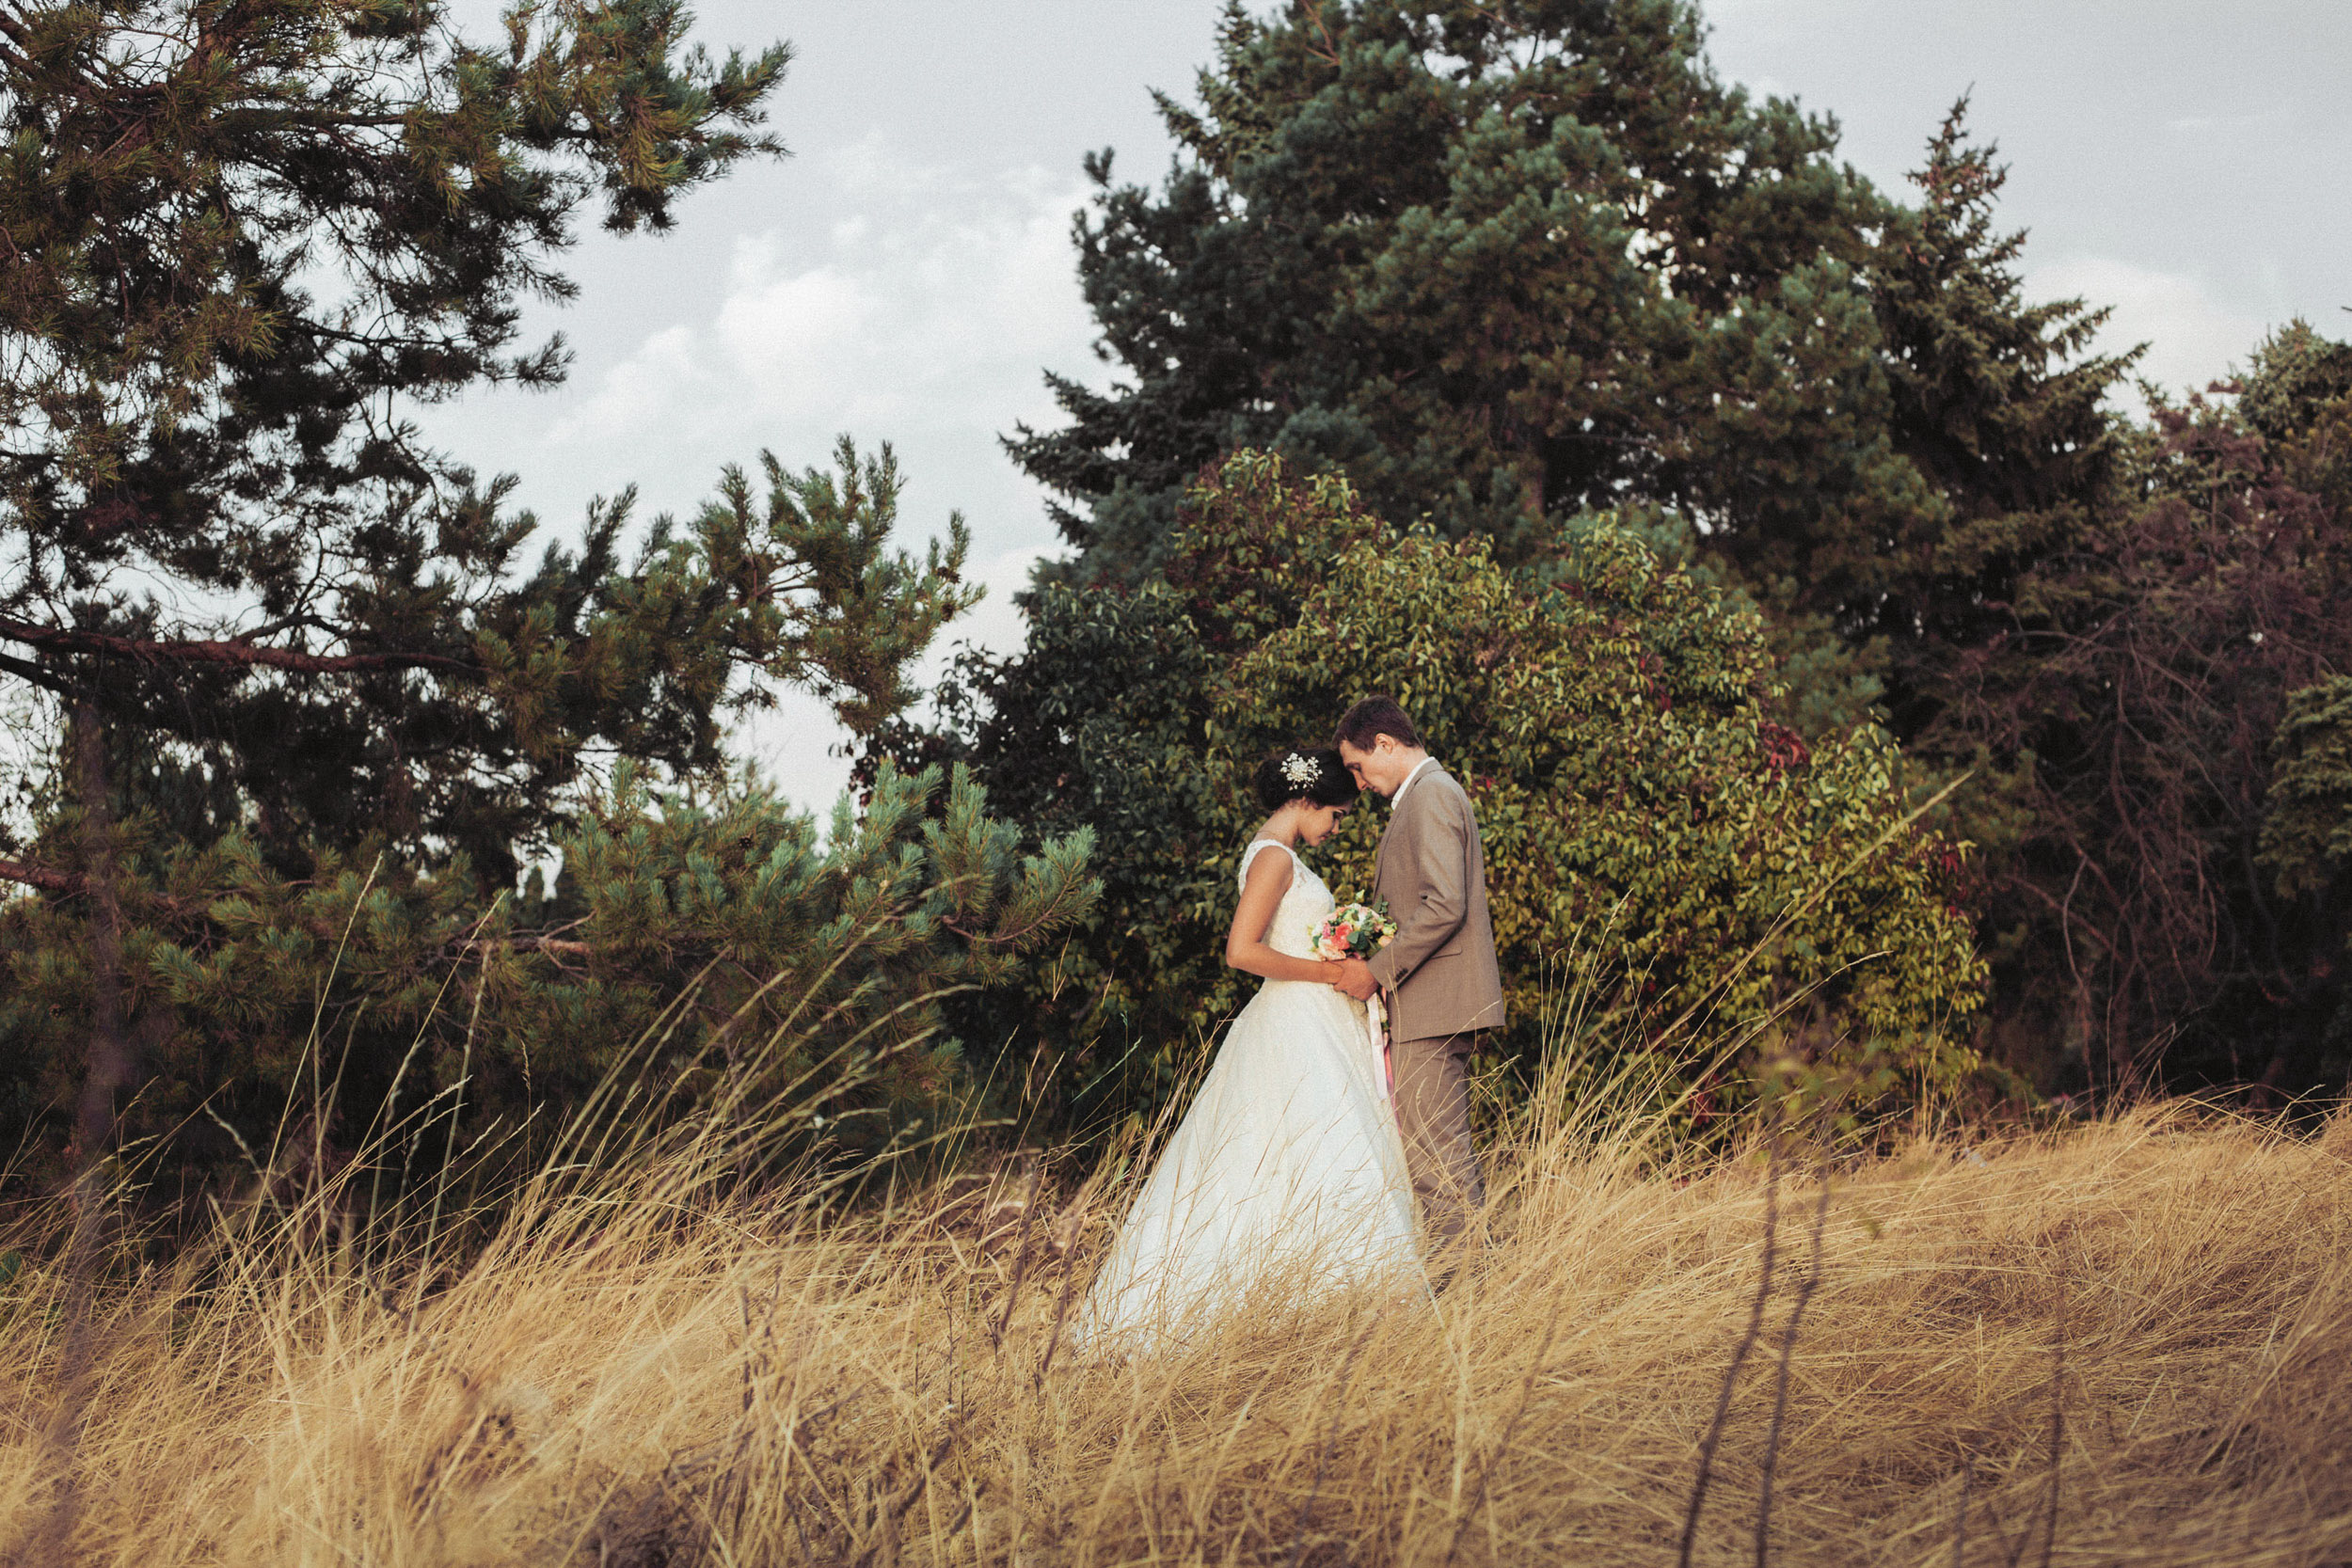 hochzeitsfotografie-schweiz_wedding-photographer-switzerland-europe_Bendik-Photography-102